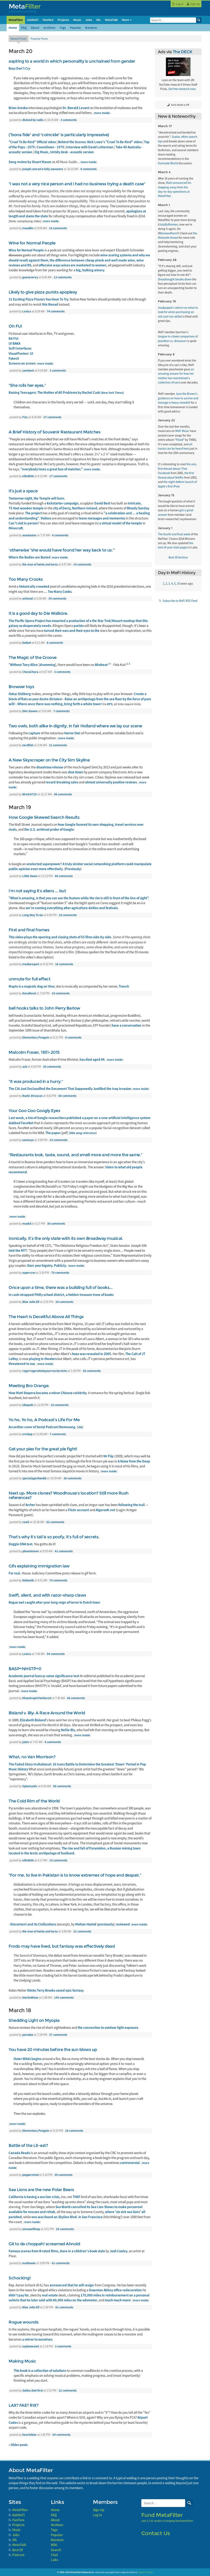 MetaFilter Competitors, Revenue and Employees - Owler Company Profile